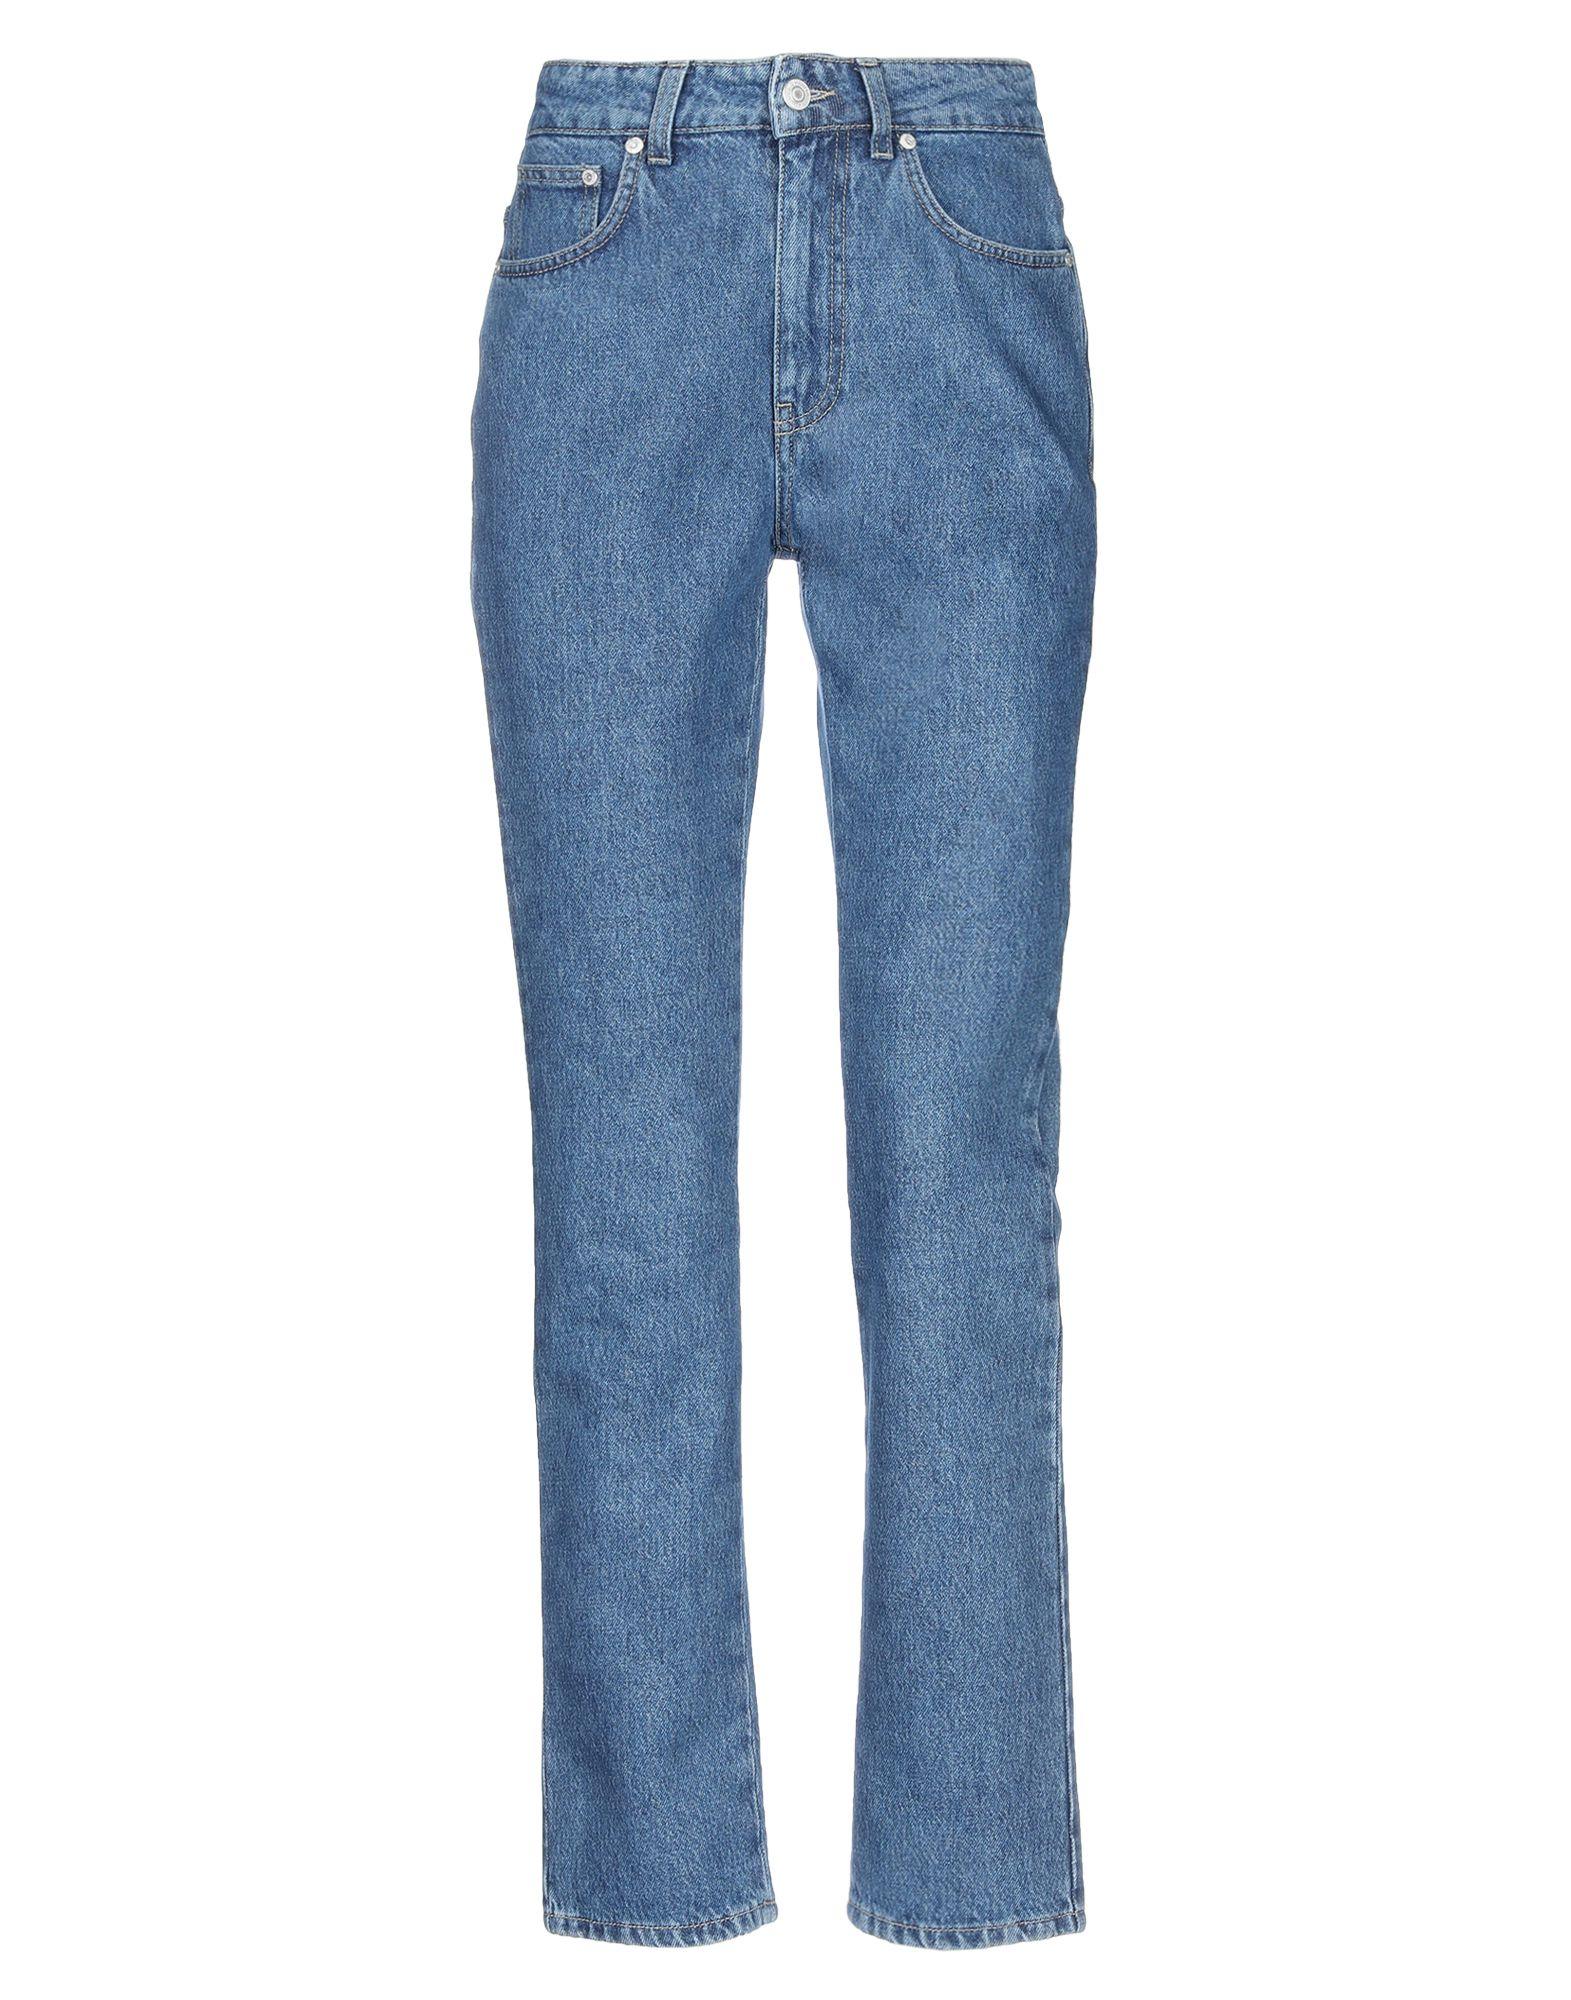 CHIARA FERRAGNI Джинсовые брюки chiara deste джинсовые брюки page 5